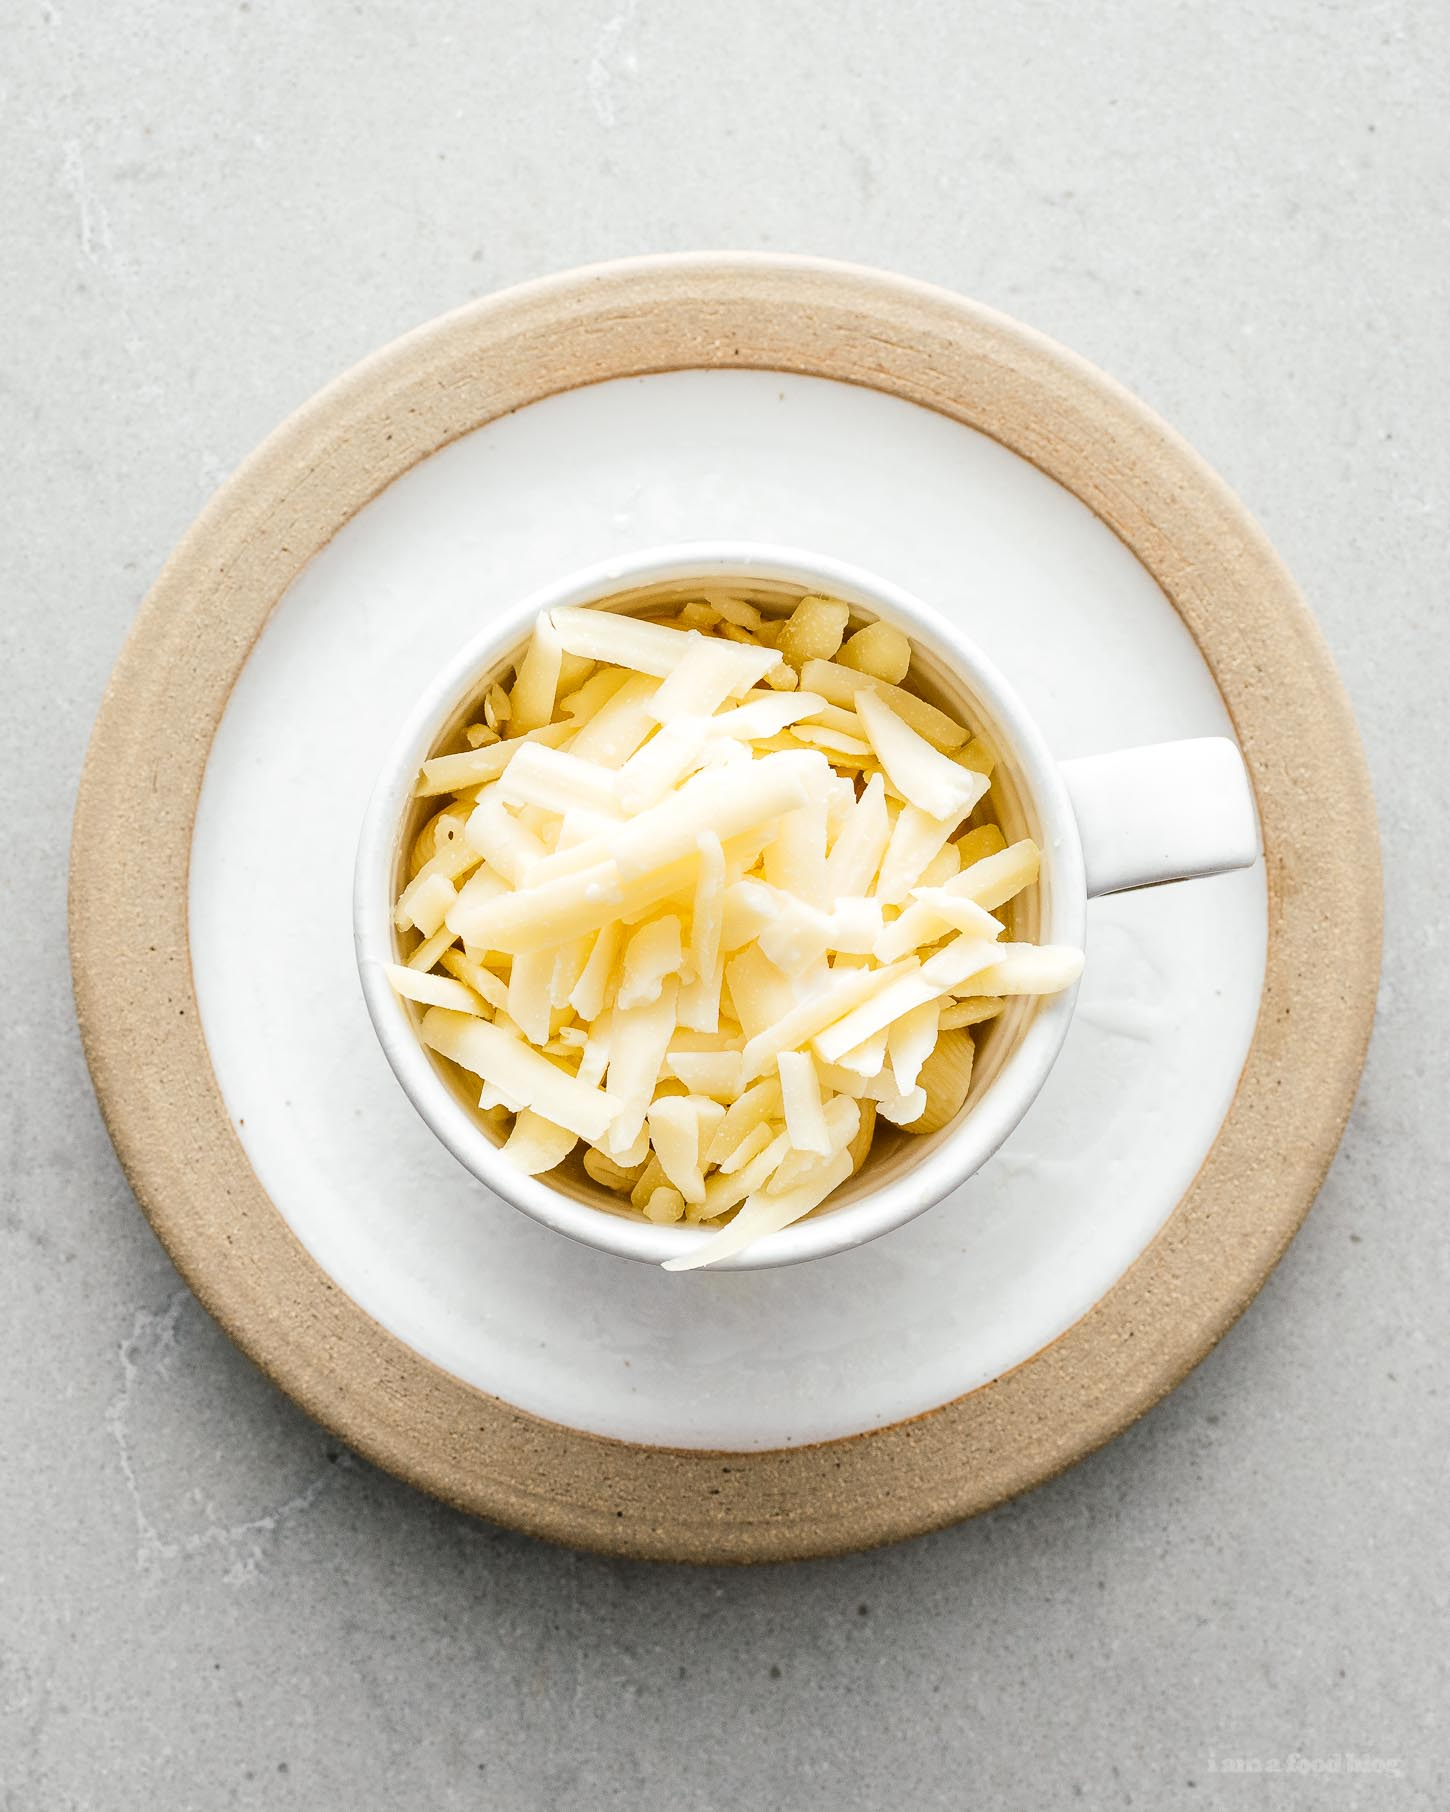 Dorm Room Microwave Mug Mac & Cheese | www.iamafoodblog.com